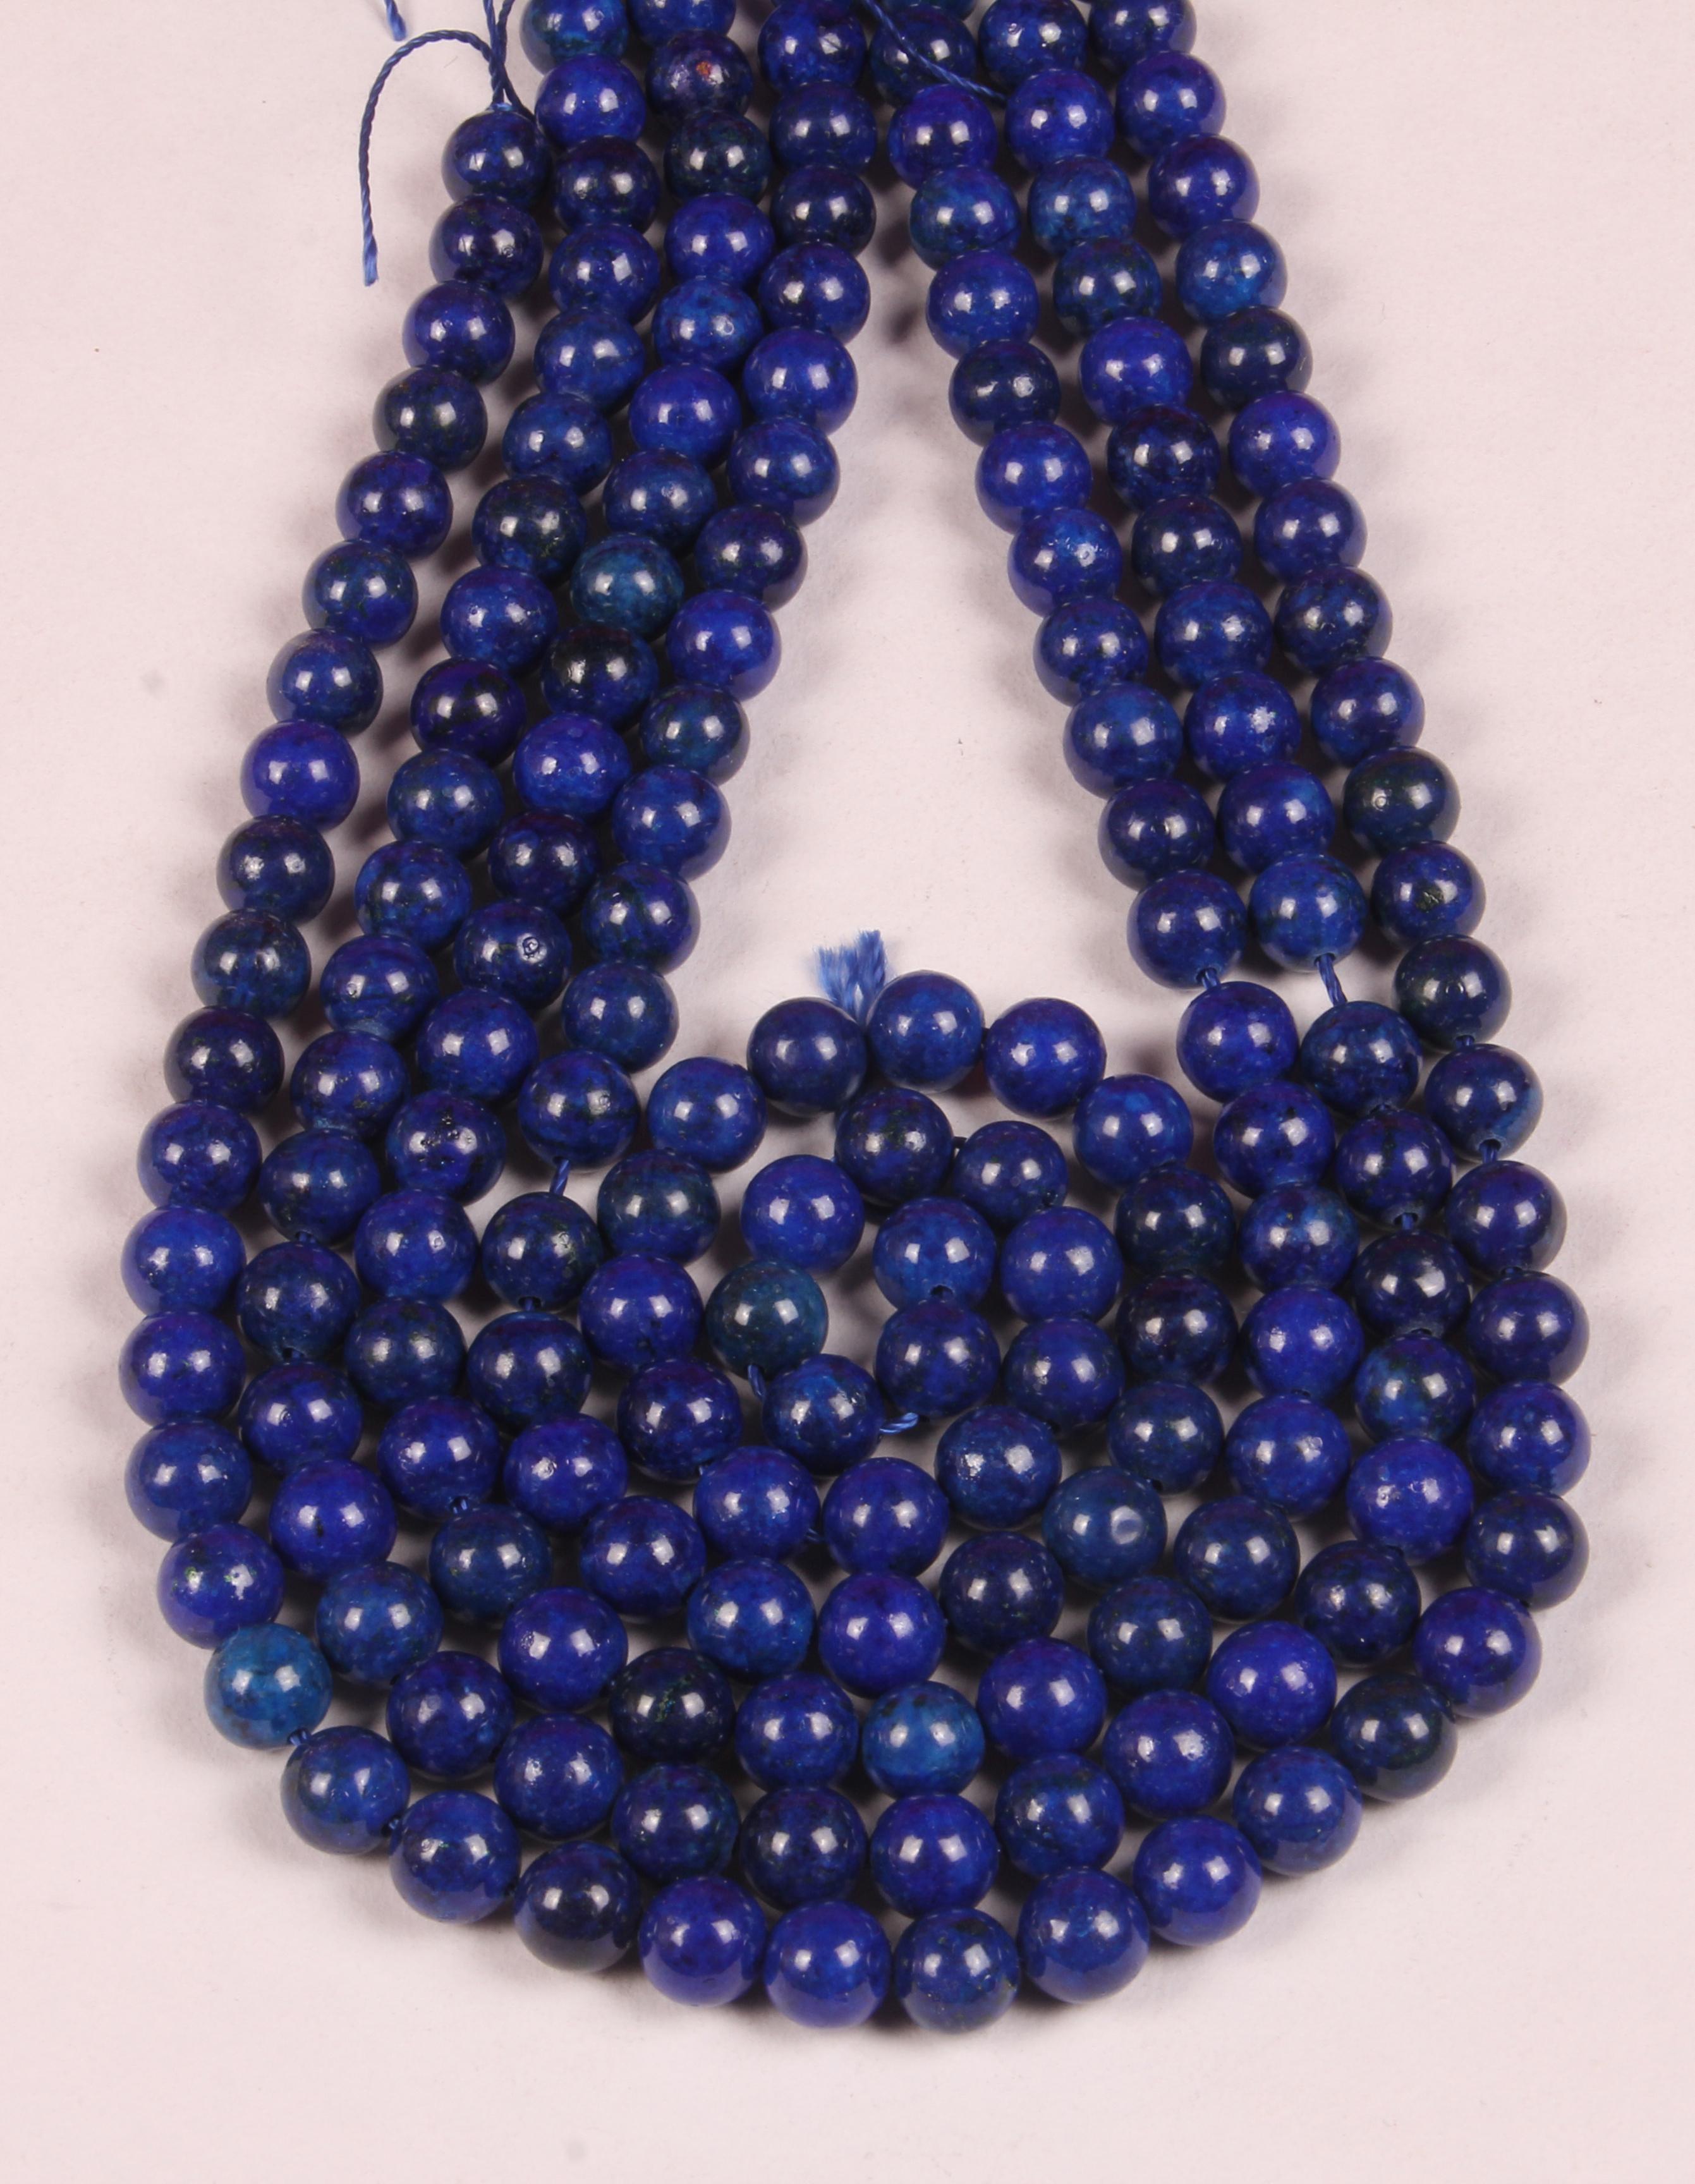 Lapis Lazuli 8 MM Beads